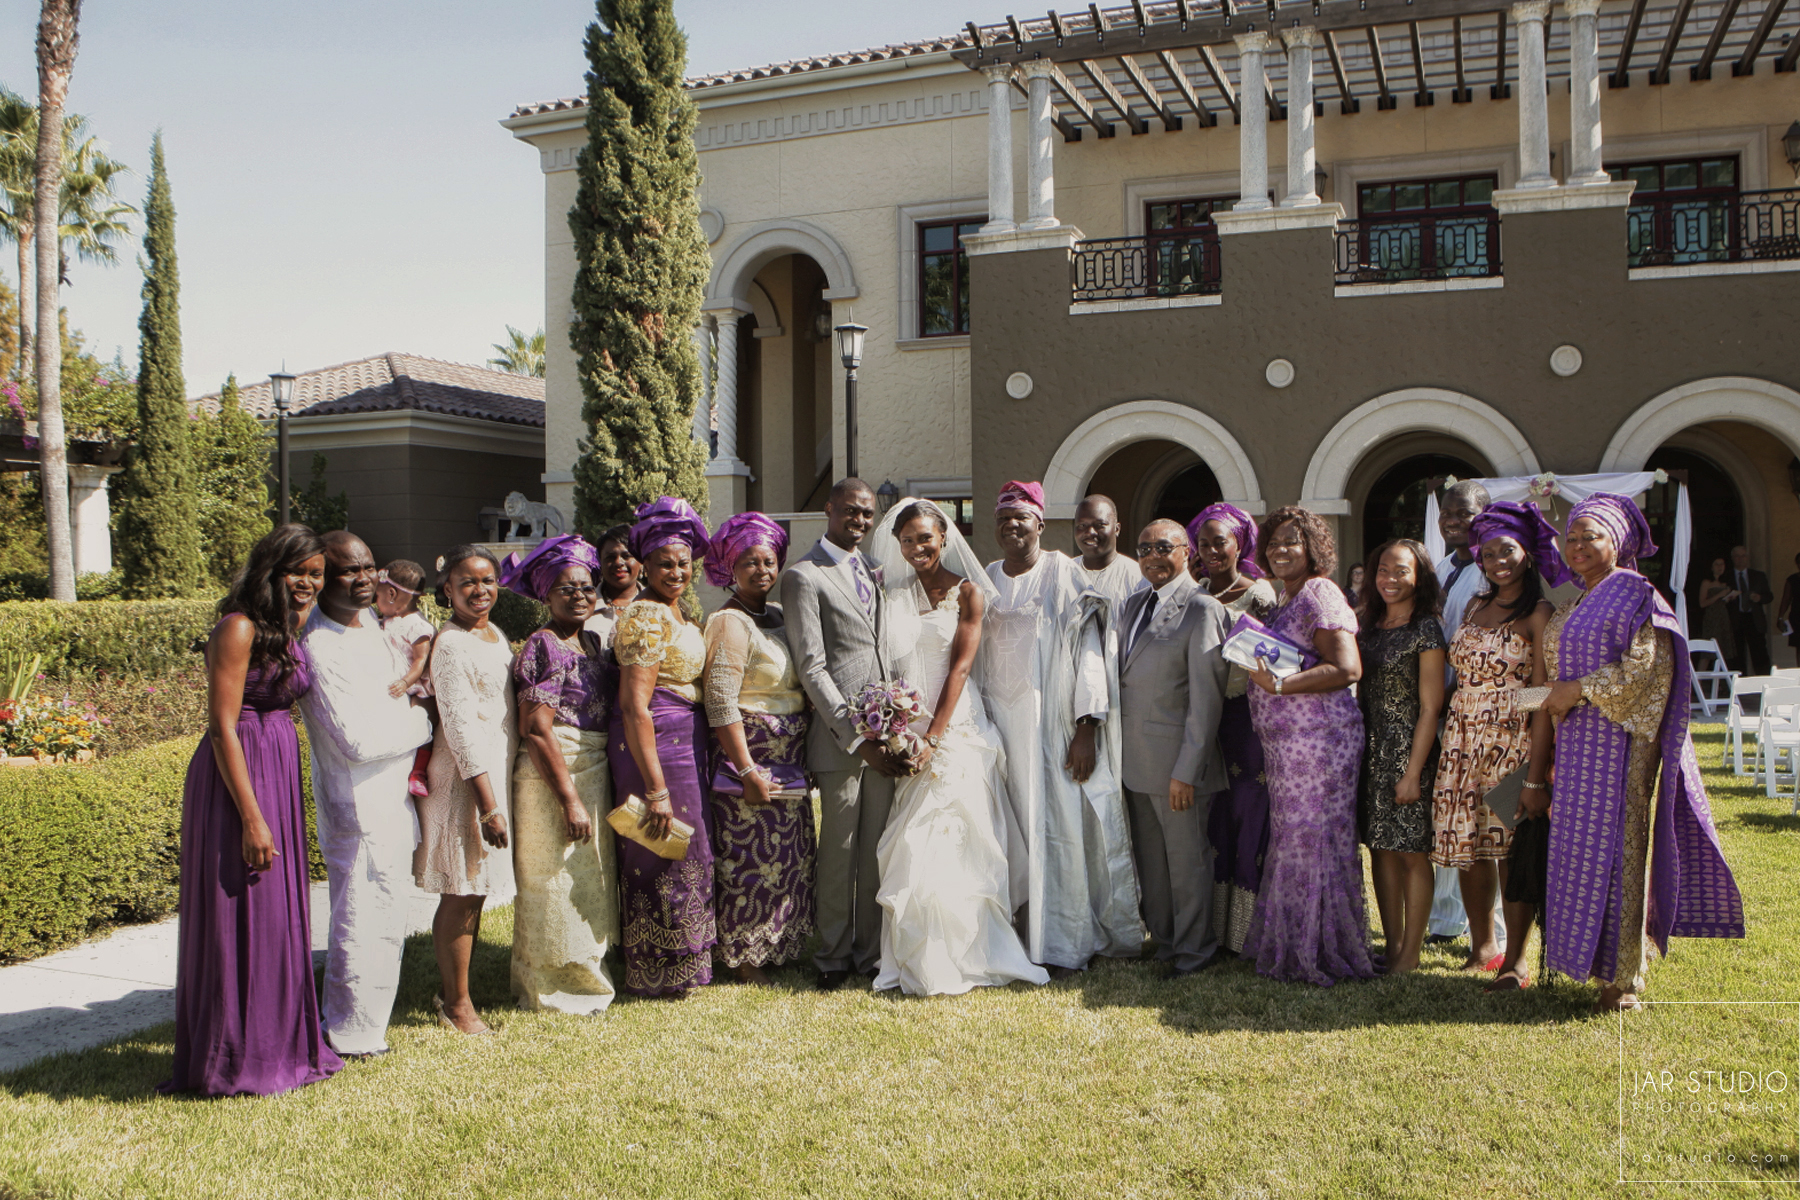 17-traditional-modern-nigerian-wedding-family-portrait-orlando-wedding-photographer-jarstudio.JPG